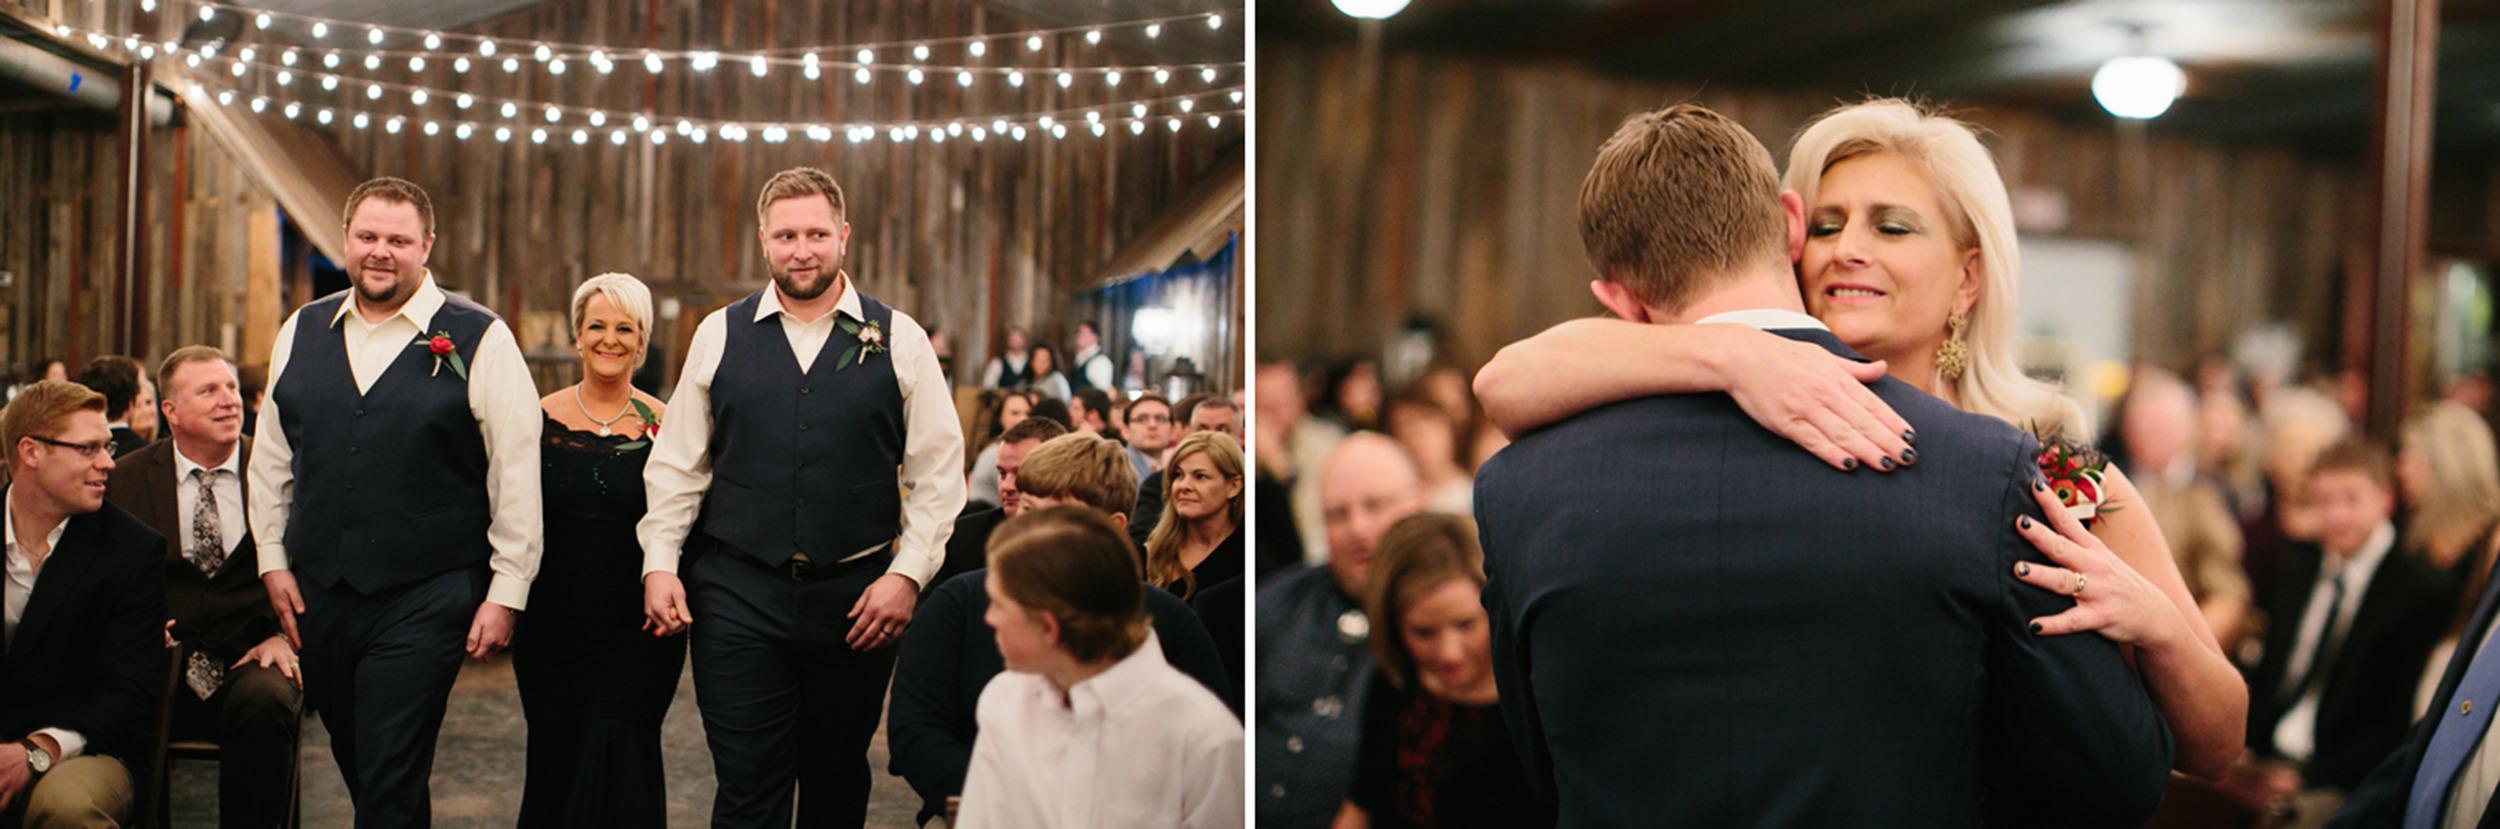 Cotton_Creek_Barn_Winter_Wedding_WeddingPhotographer042.jpg